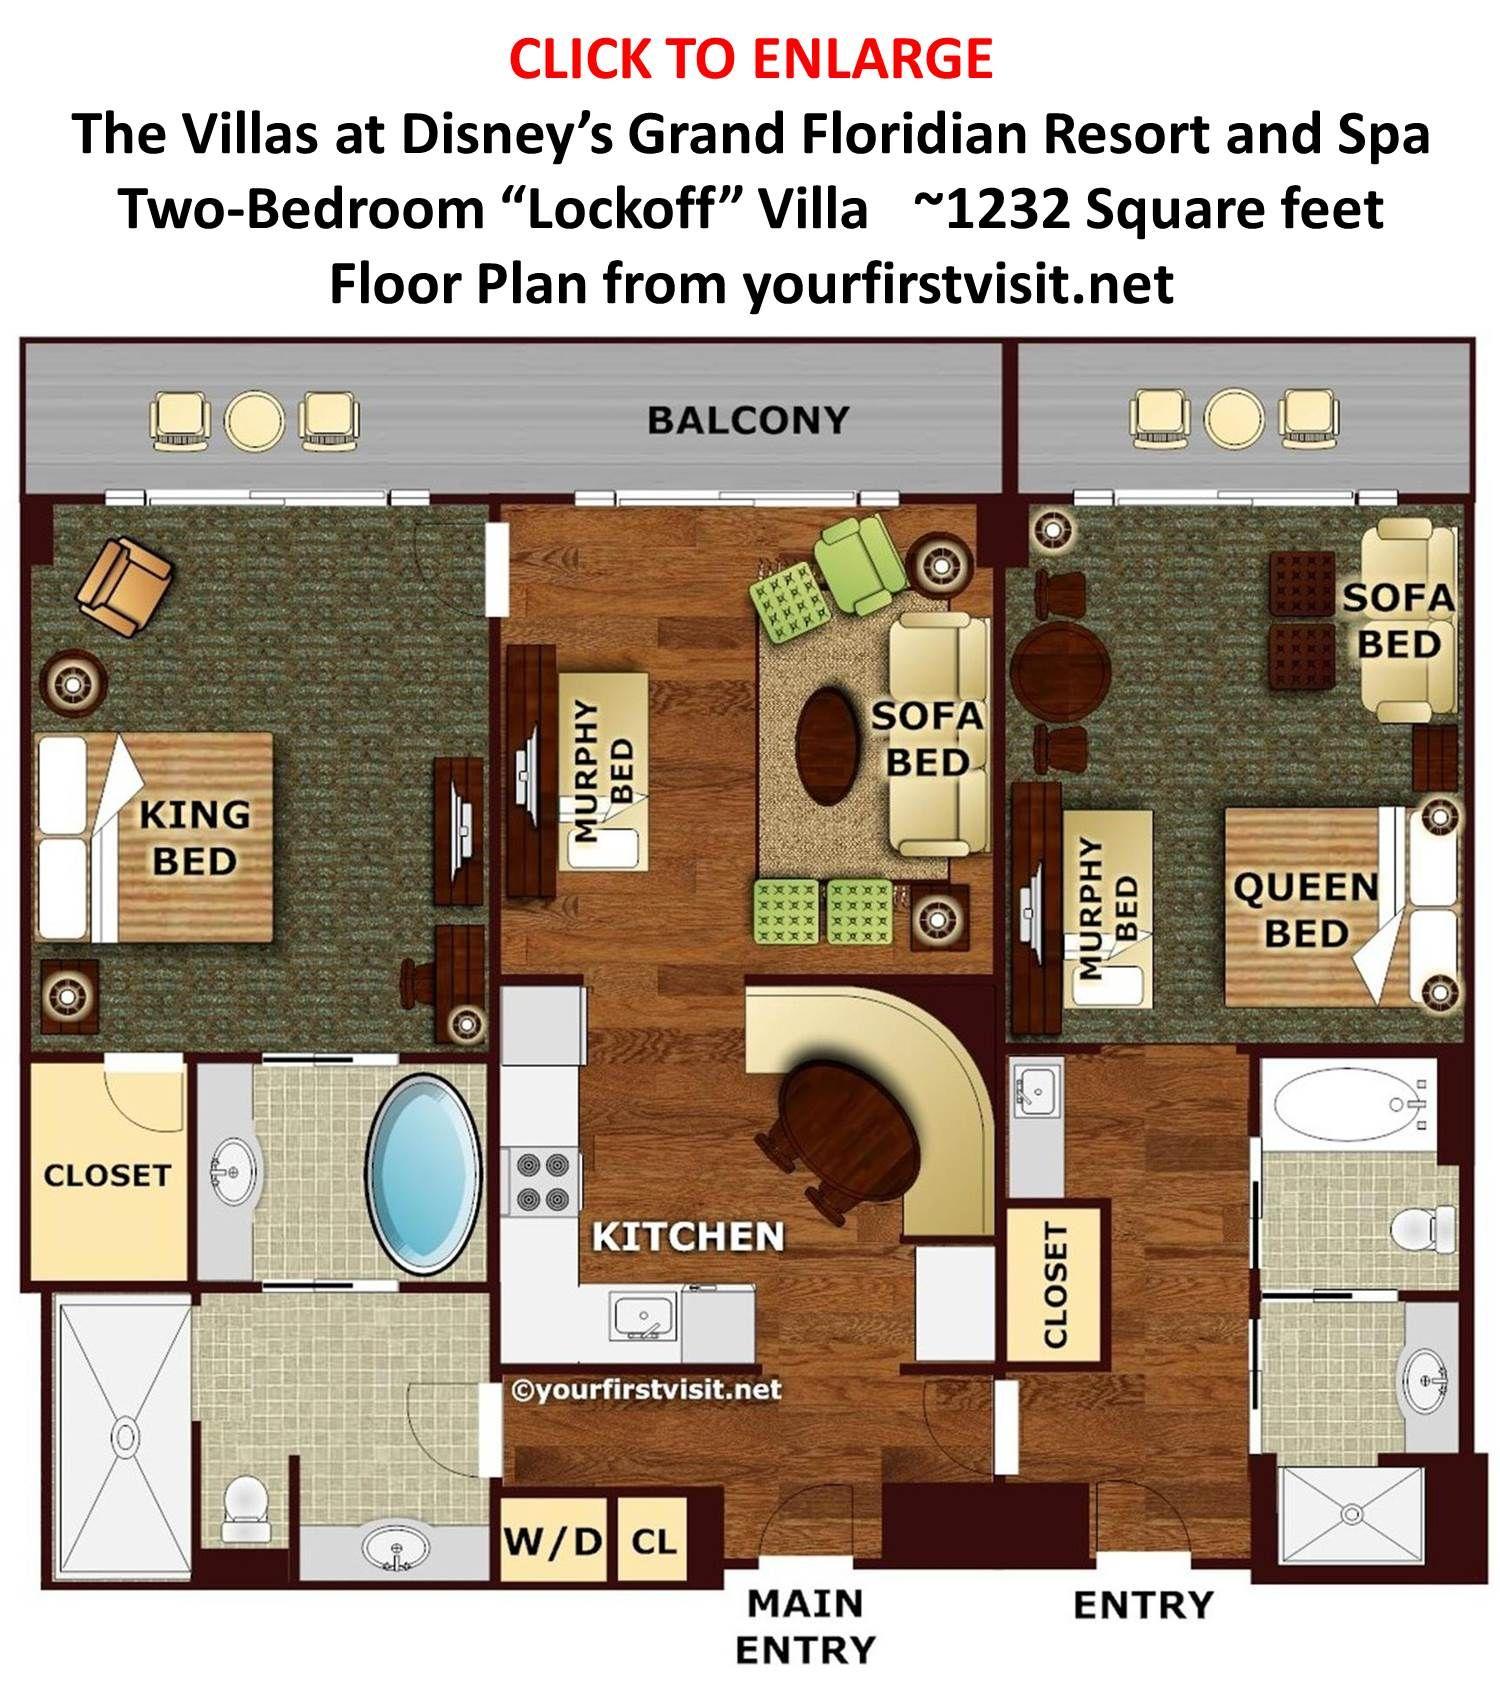 Review The Villas at Disney's Grand Floridian Resort